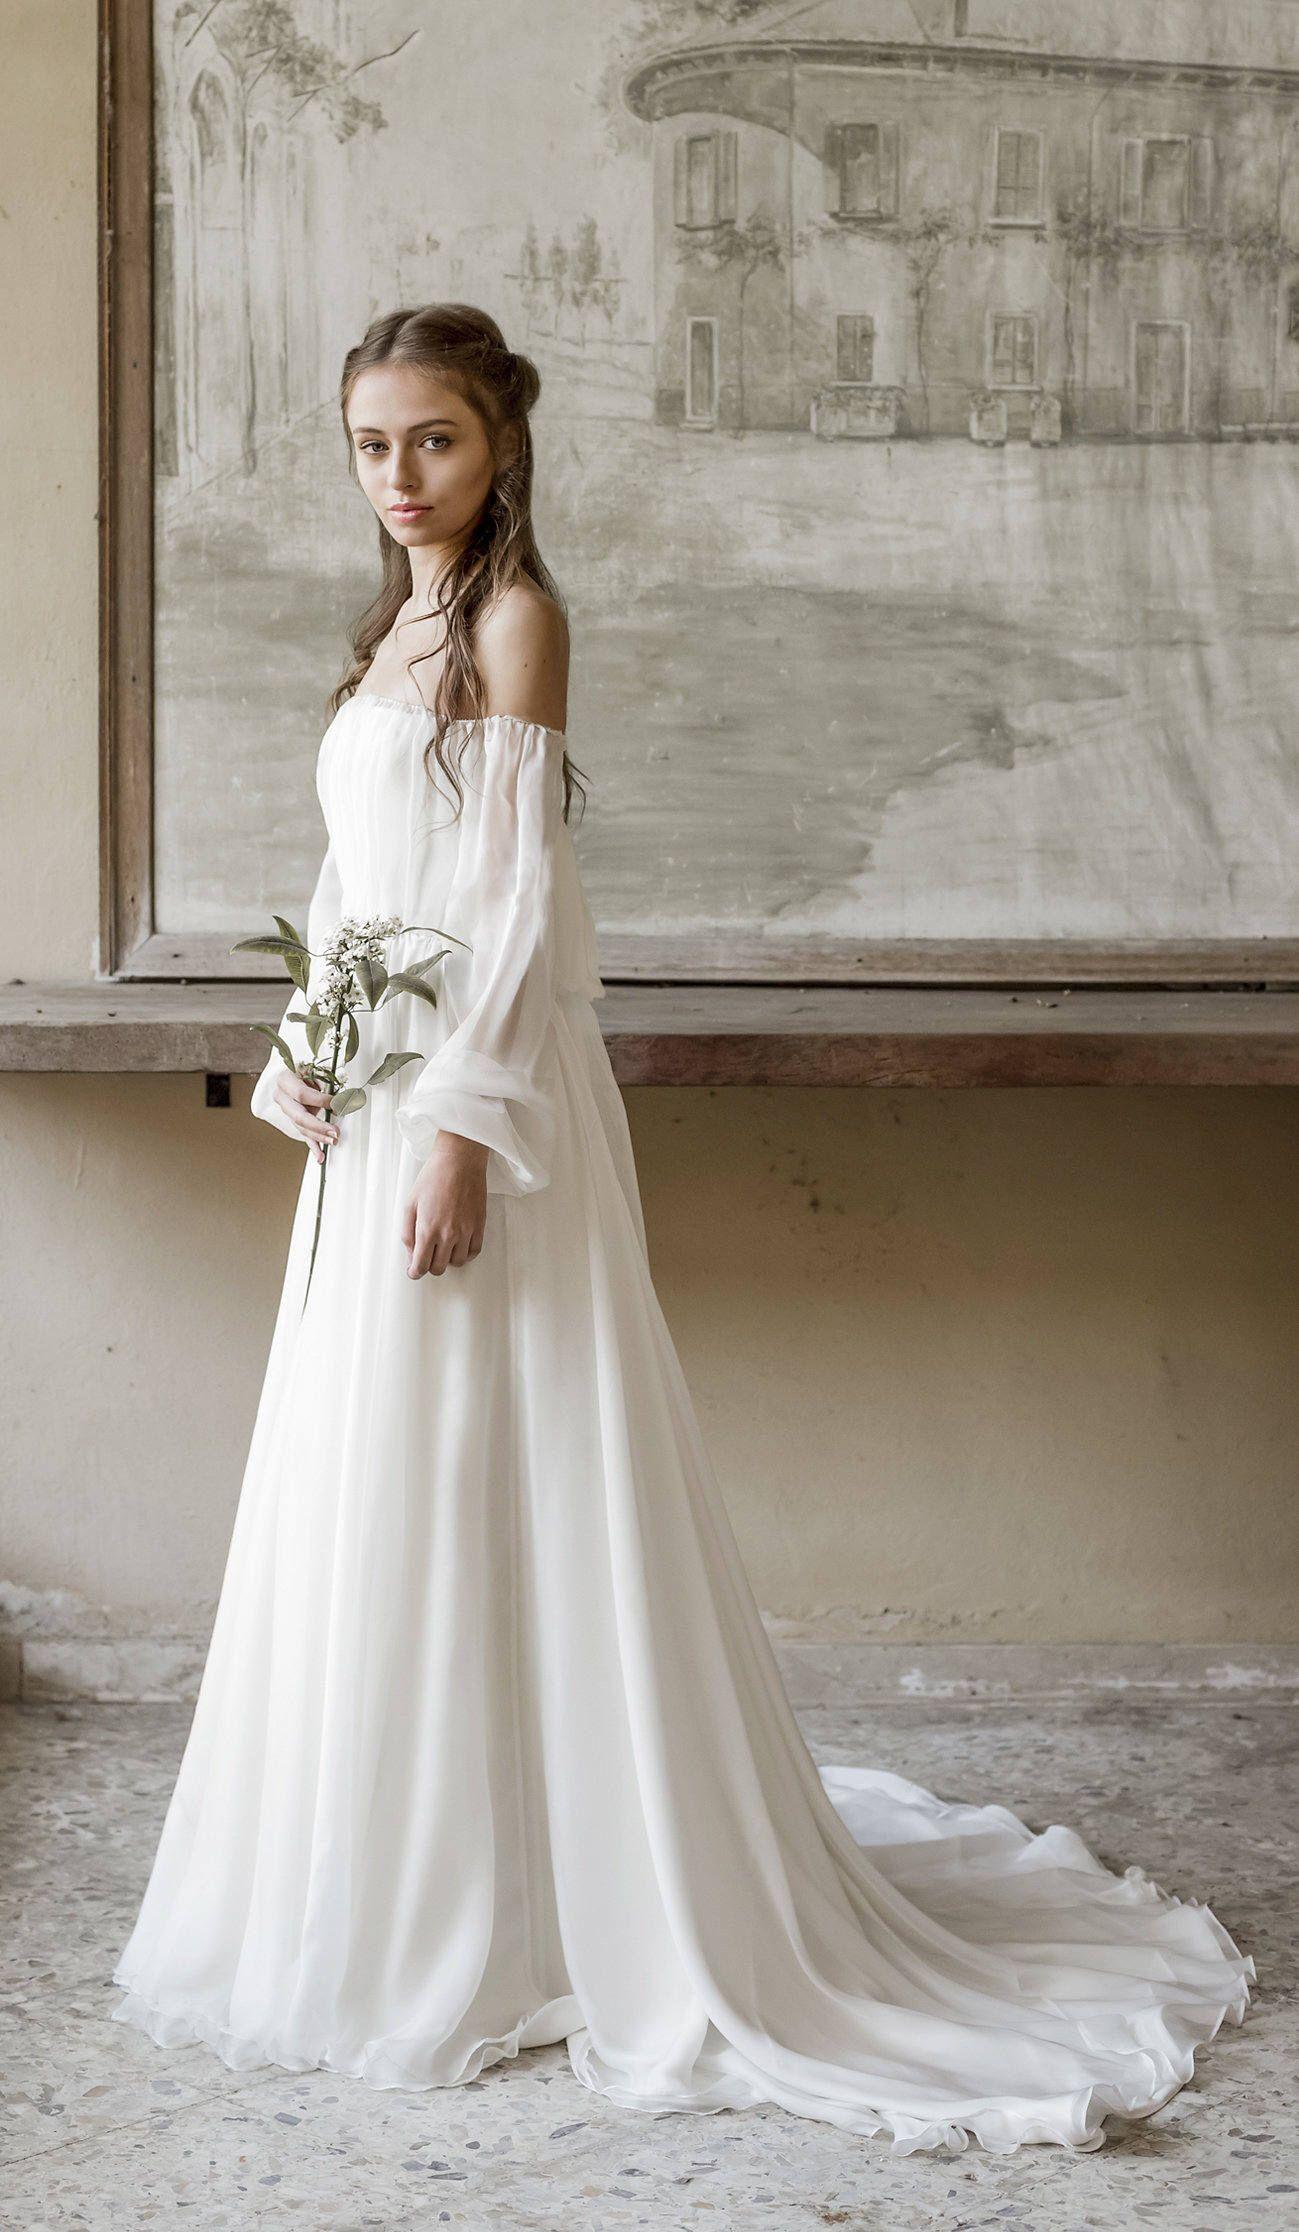 Sample Sale Bohemian Wedding Dress Boho Wedding Dress Beach Etsy Destination Wedding Dress Bohemian Wedding Dress Boho Wedding Dress Bohemian,Plus Size Older Bride Wedding Dresses